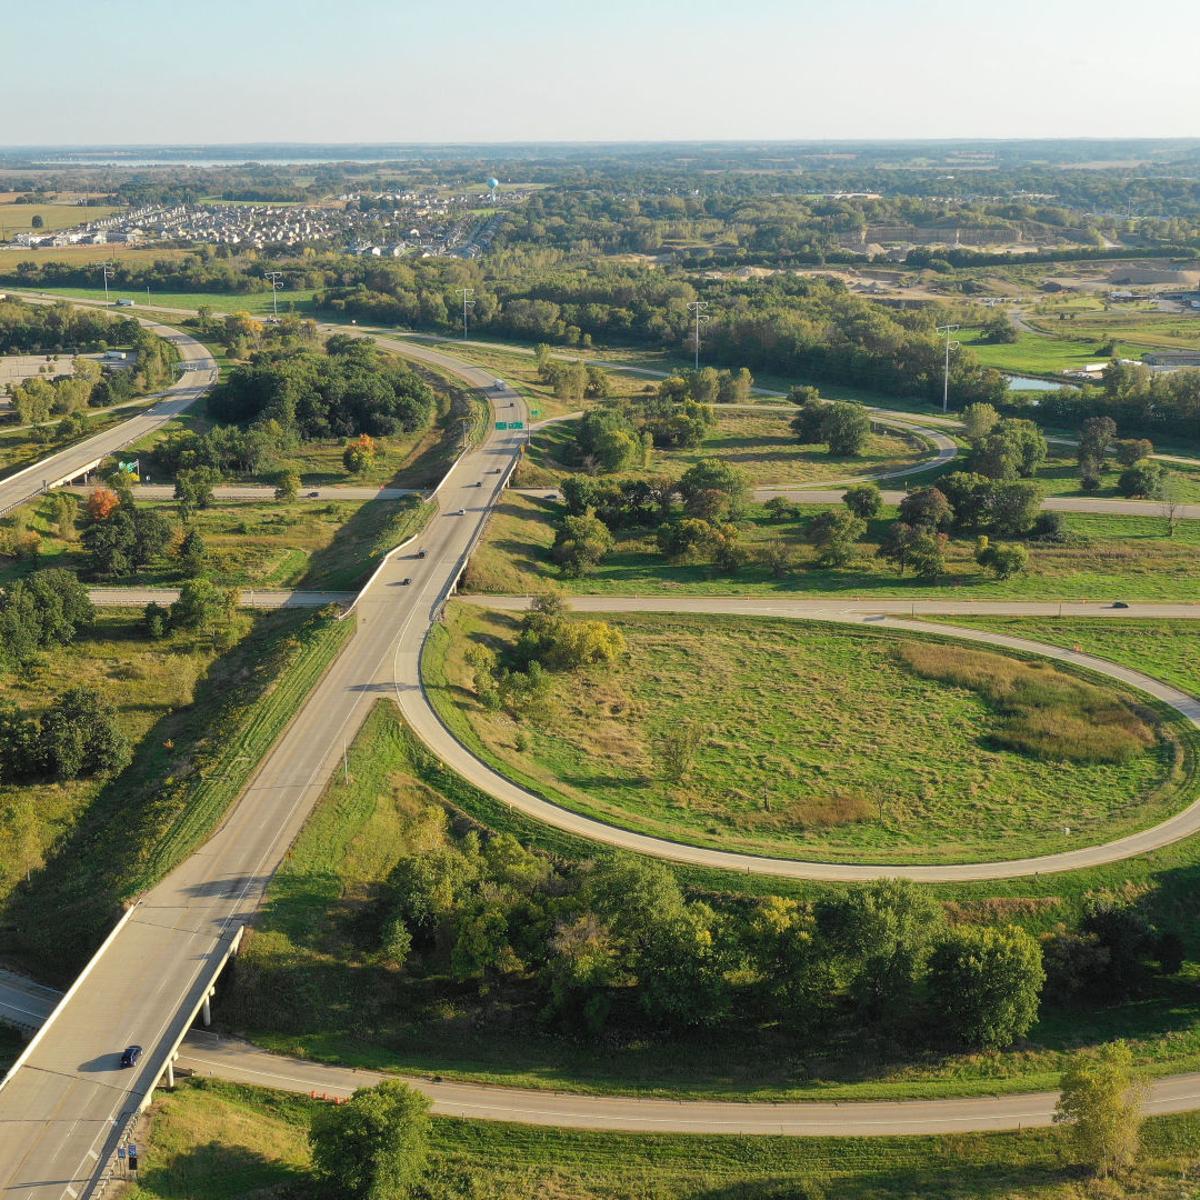 Critics call WisDOT's preferred plan for I-39/90 at Beltline 'brand